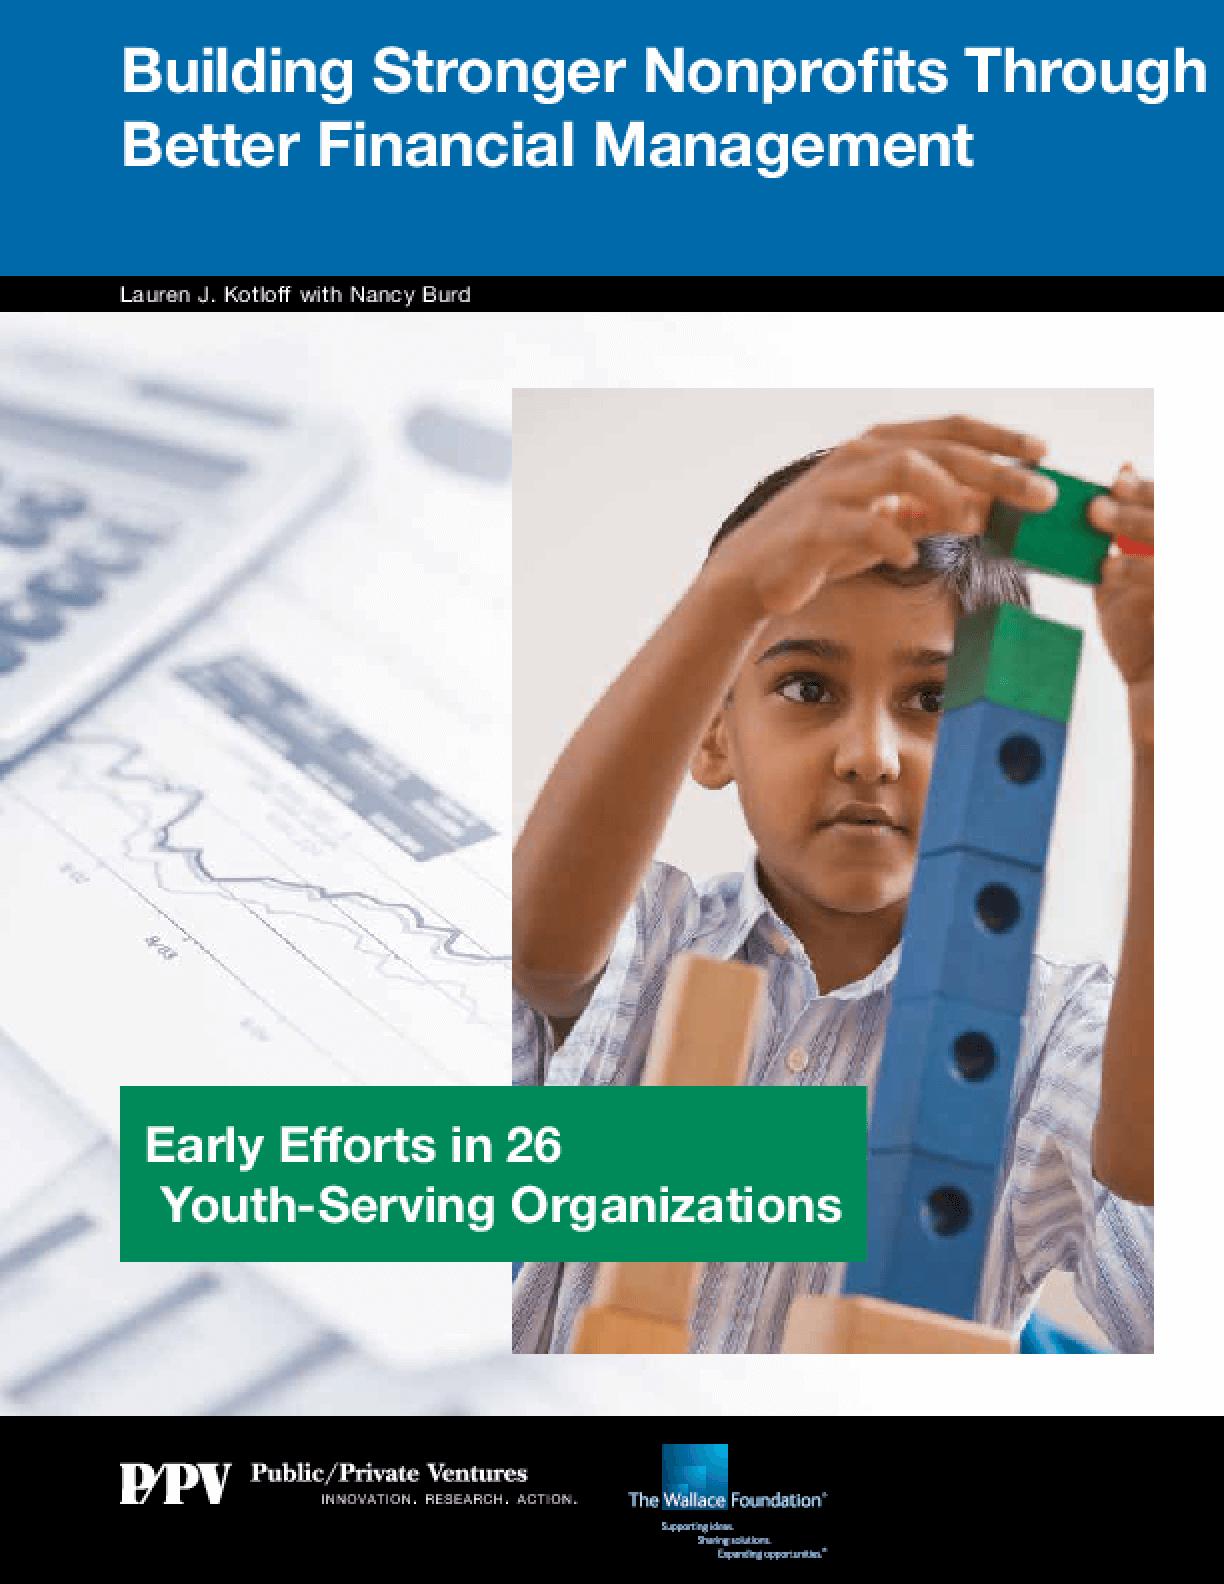 Building Stronger Nonprofits Through Better Financial Management